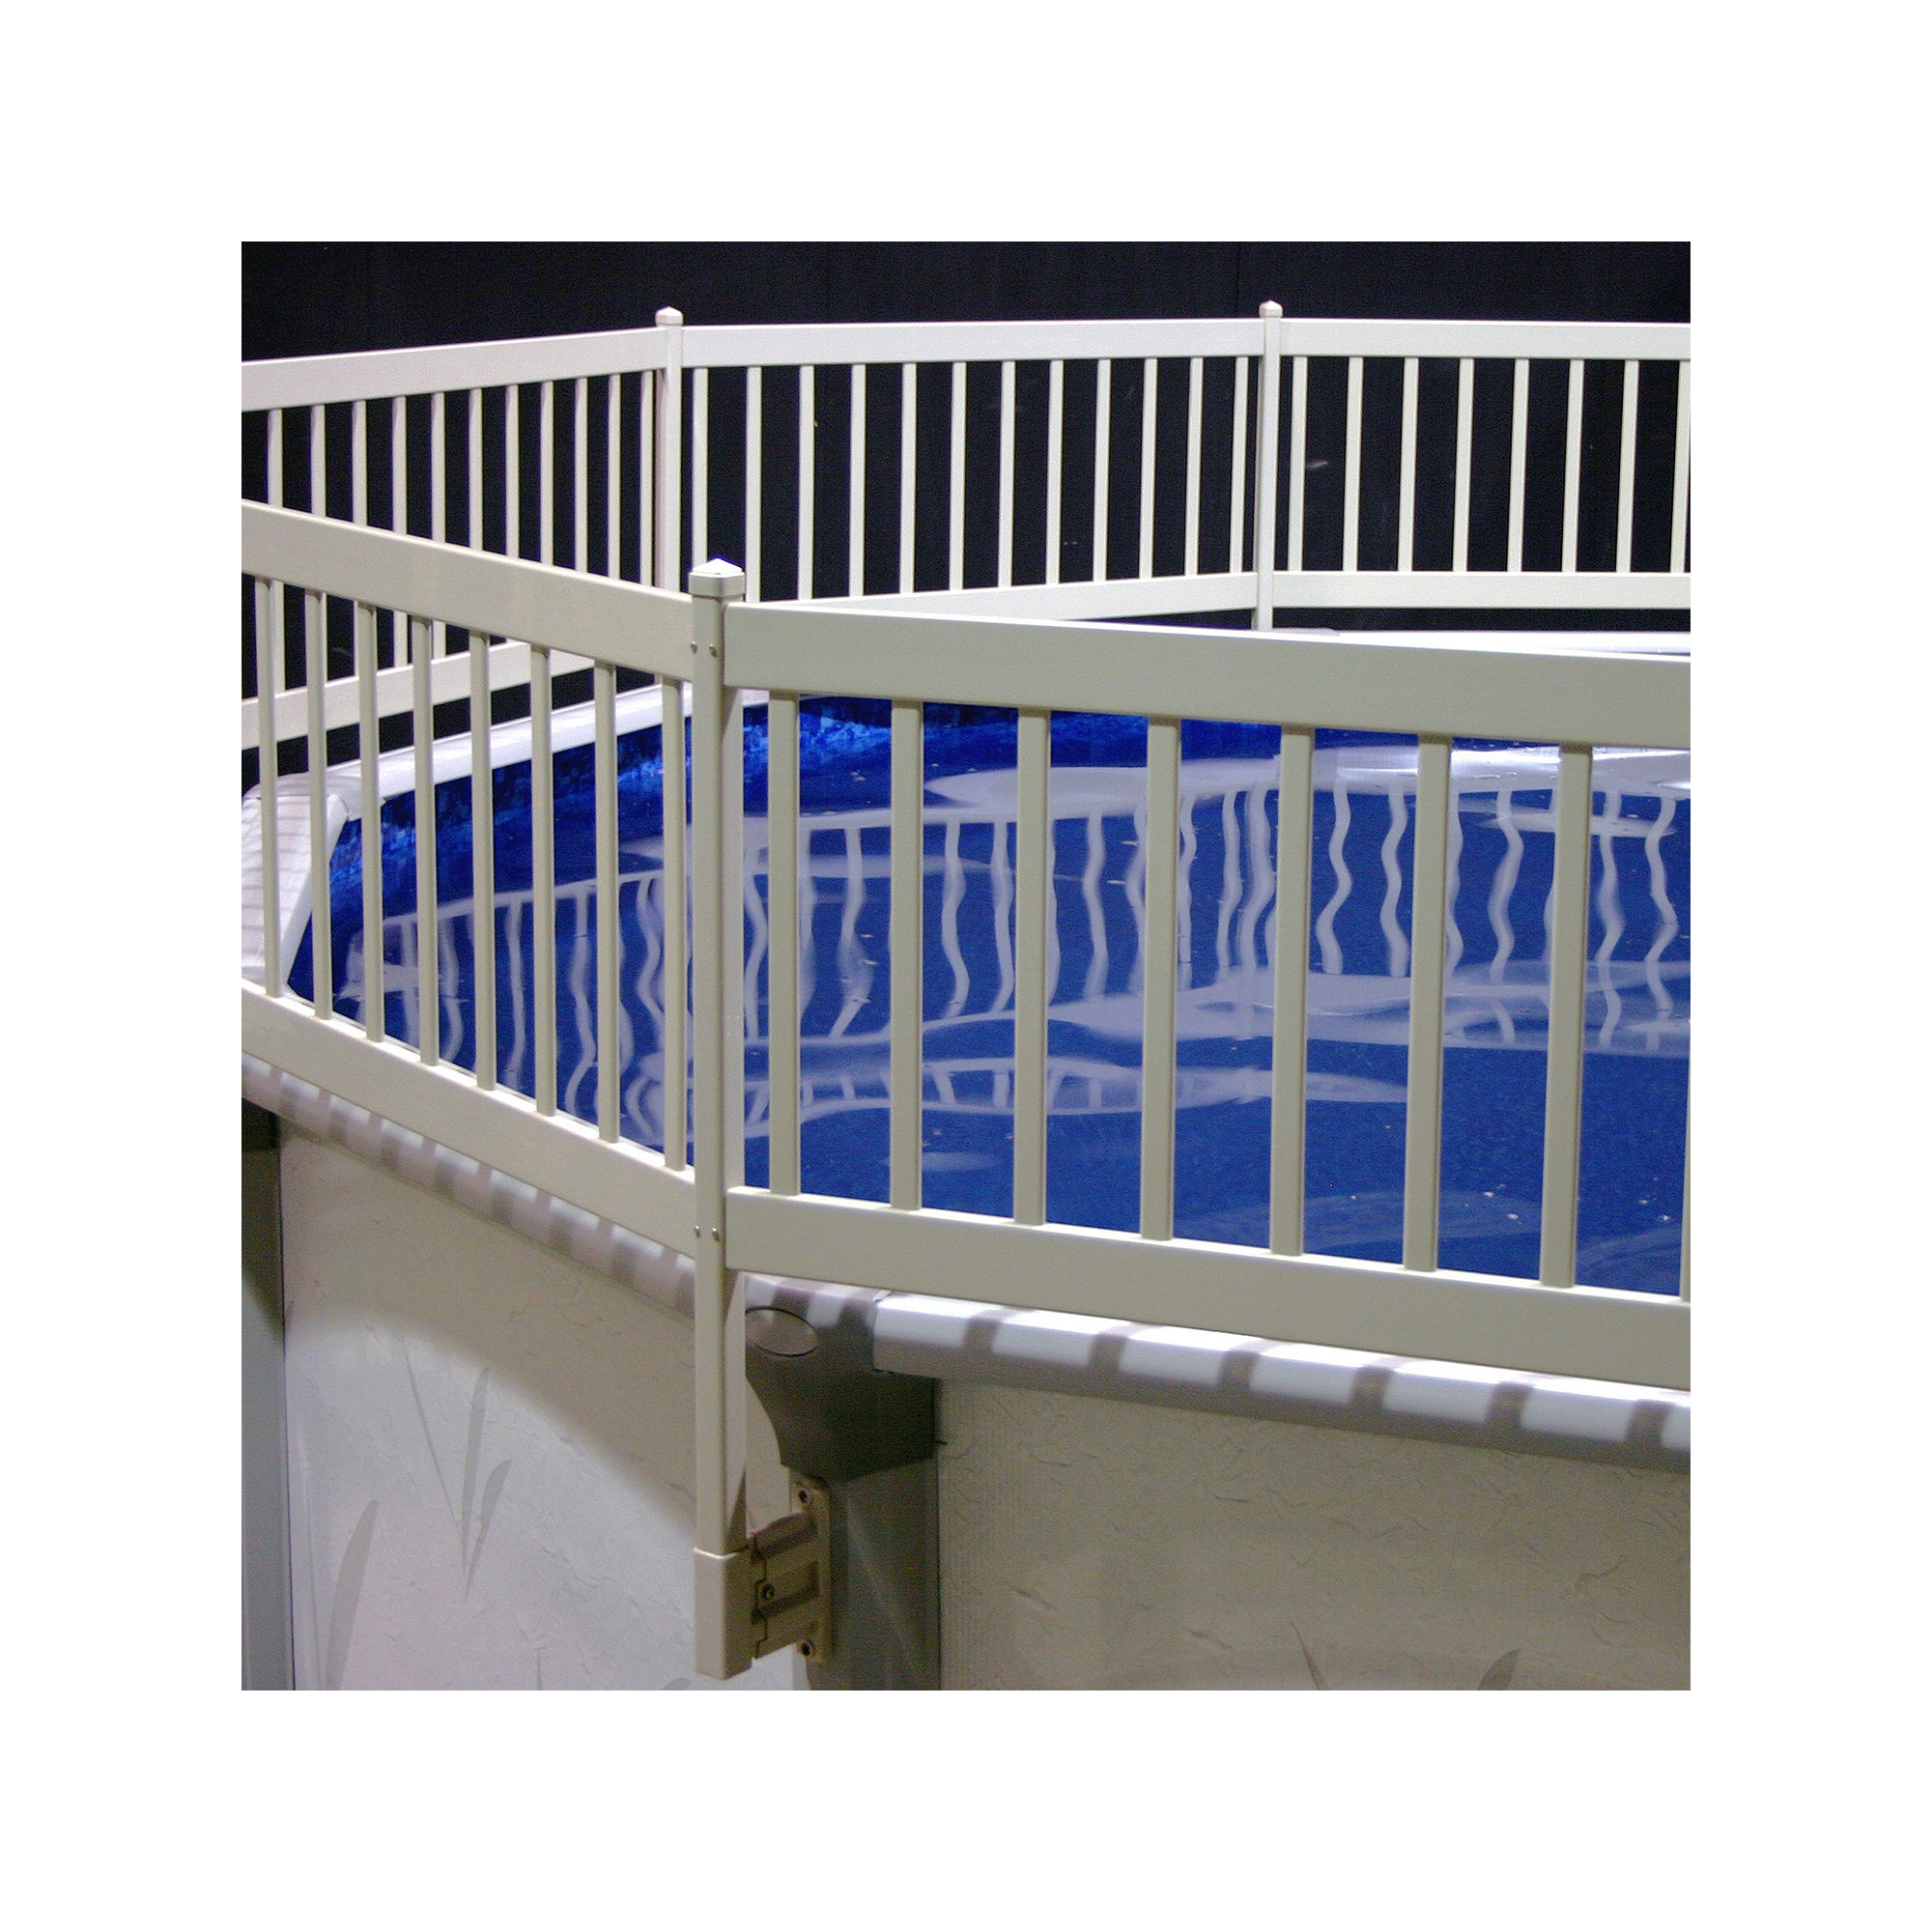 672875900701 Upc Vinyl Works Above Ground Pool Fence Kit 3 Upc